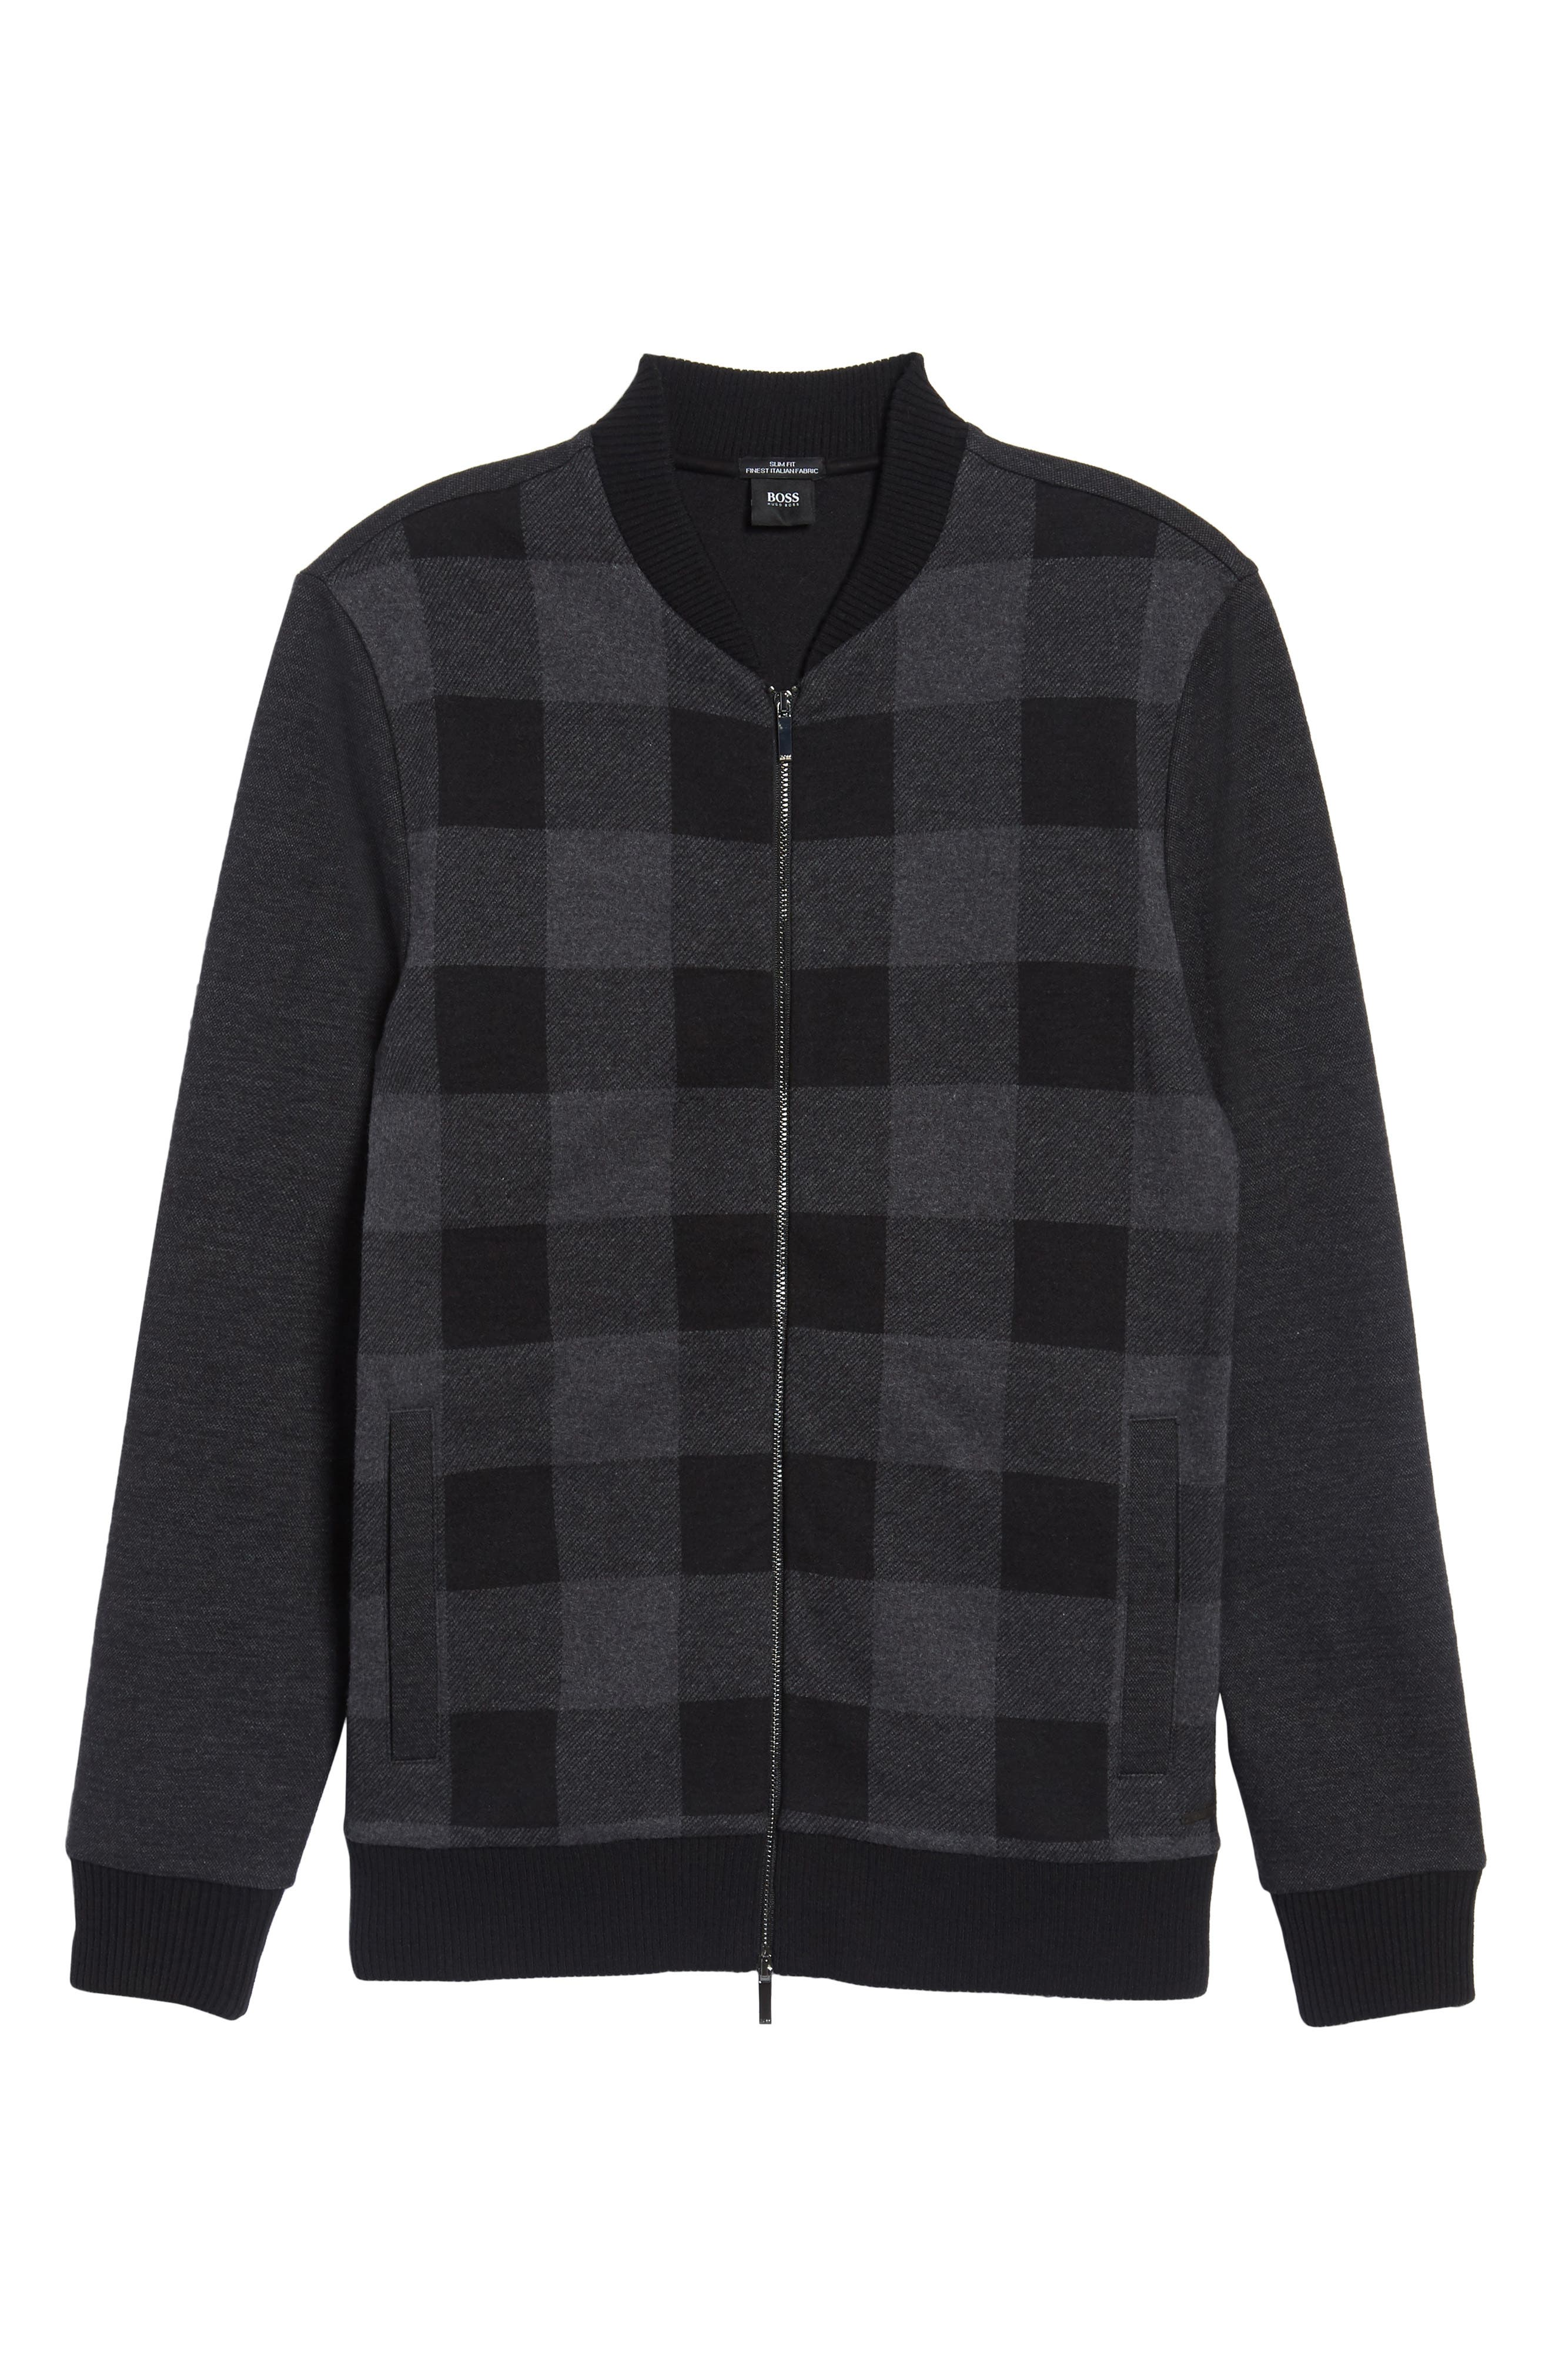 Salea Check Wool Blend Bomber Jacket,                             Alternate thumbnail 5, color,                             001